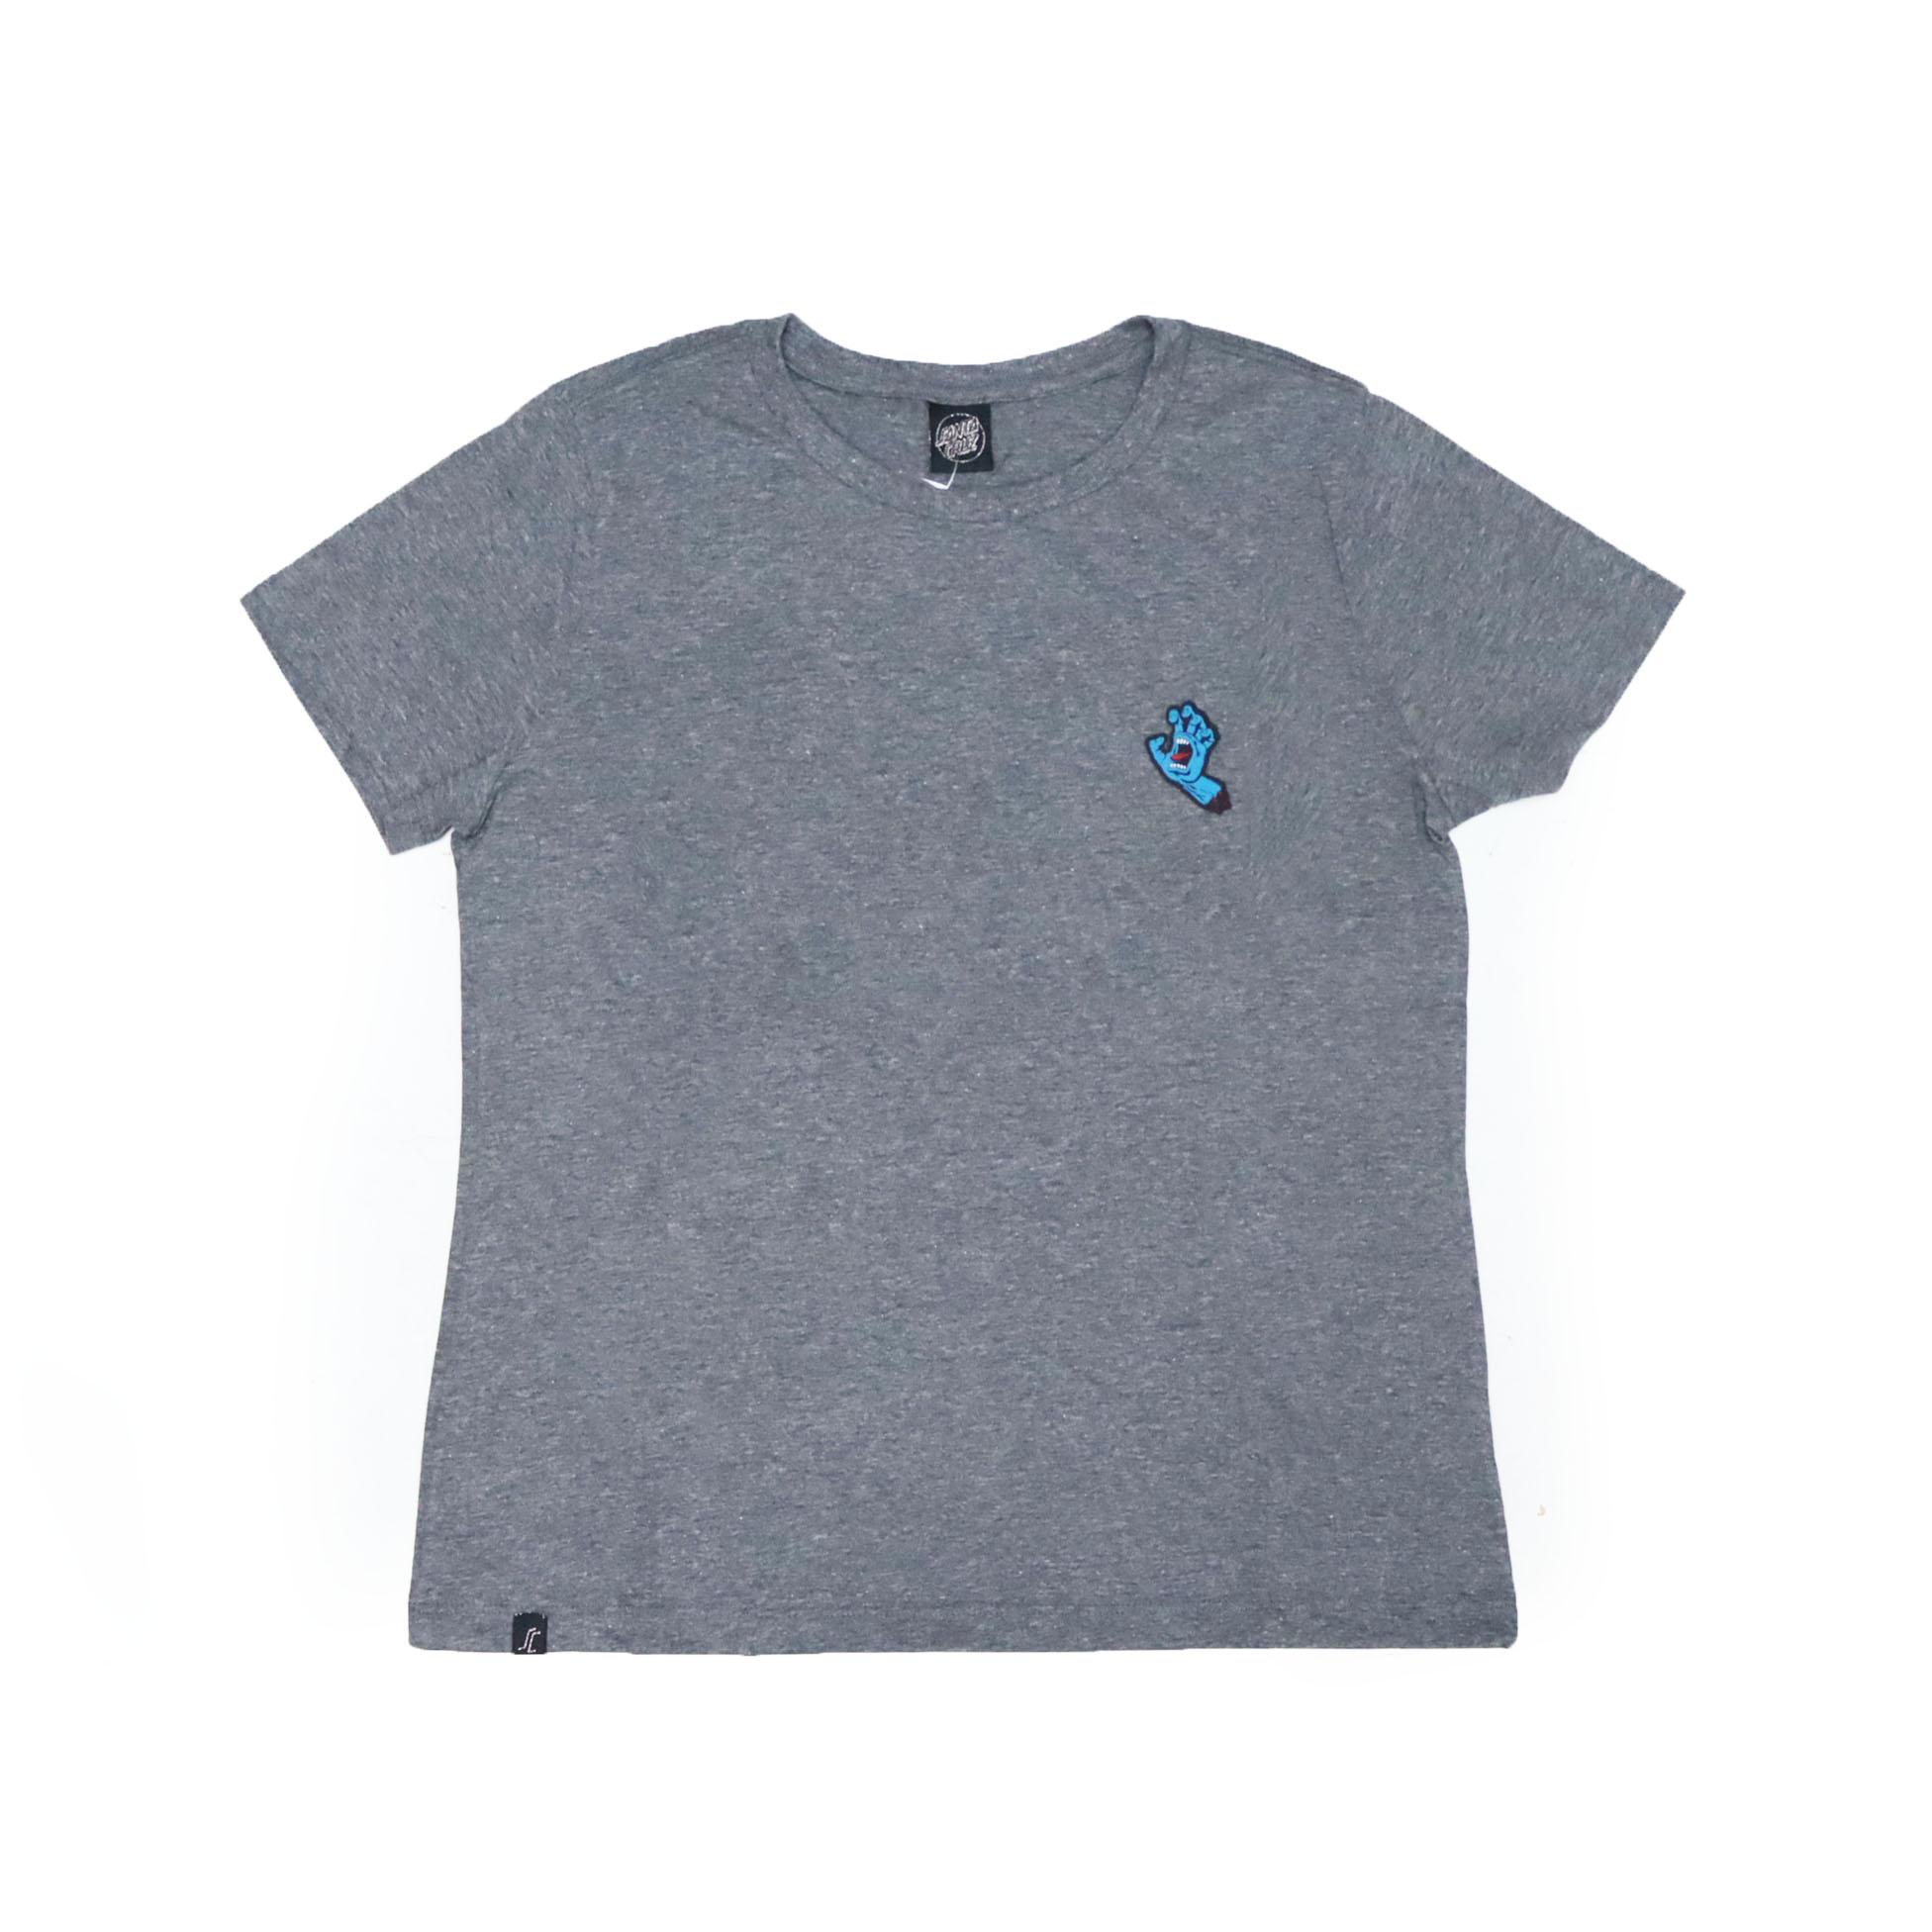 Camiseta Feminina Santa Cruz Hand Chest - Chumbo Mescla/Azul